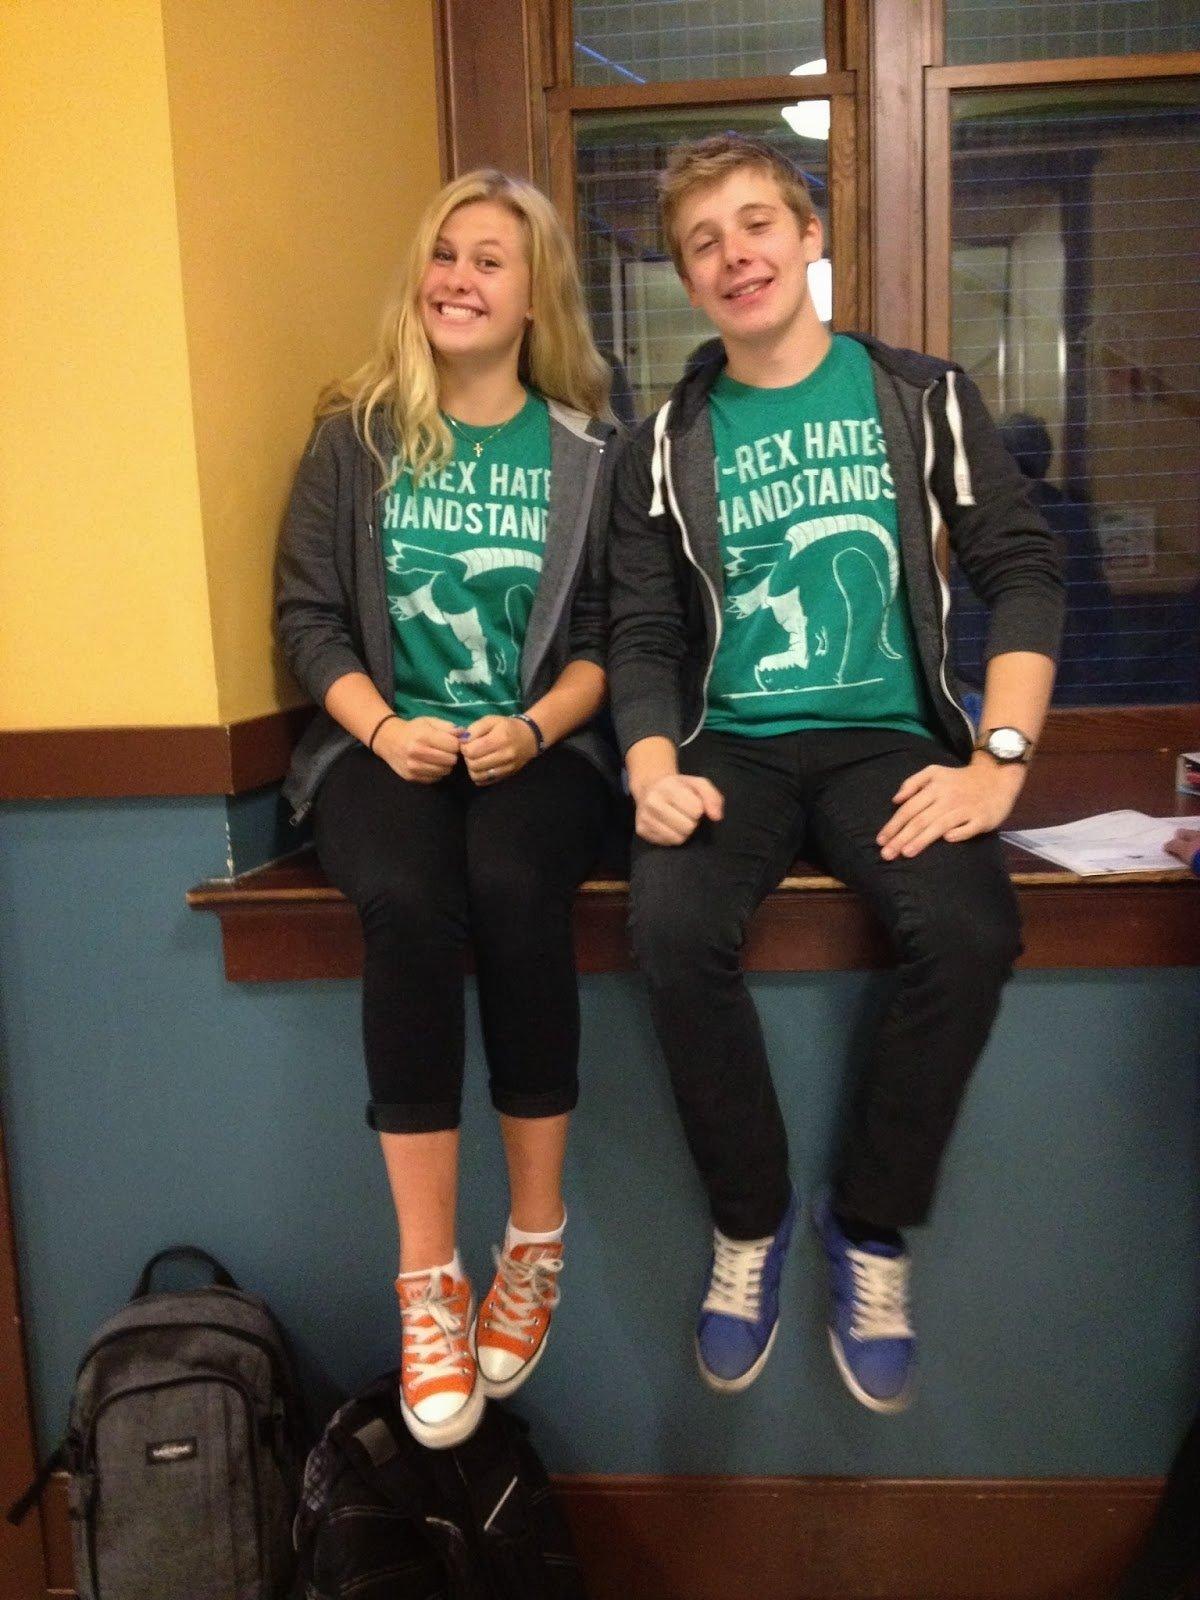 10 Elegant Cute Ideas For Twin Day cute twin day ideas for school s rk 4 2020